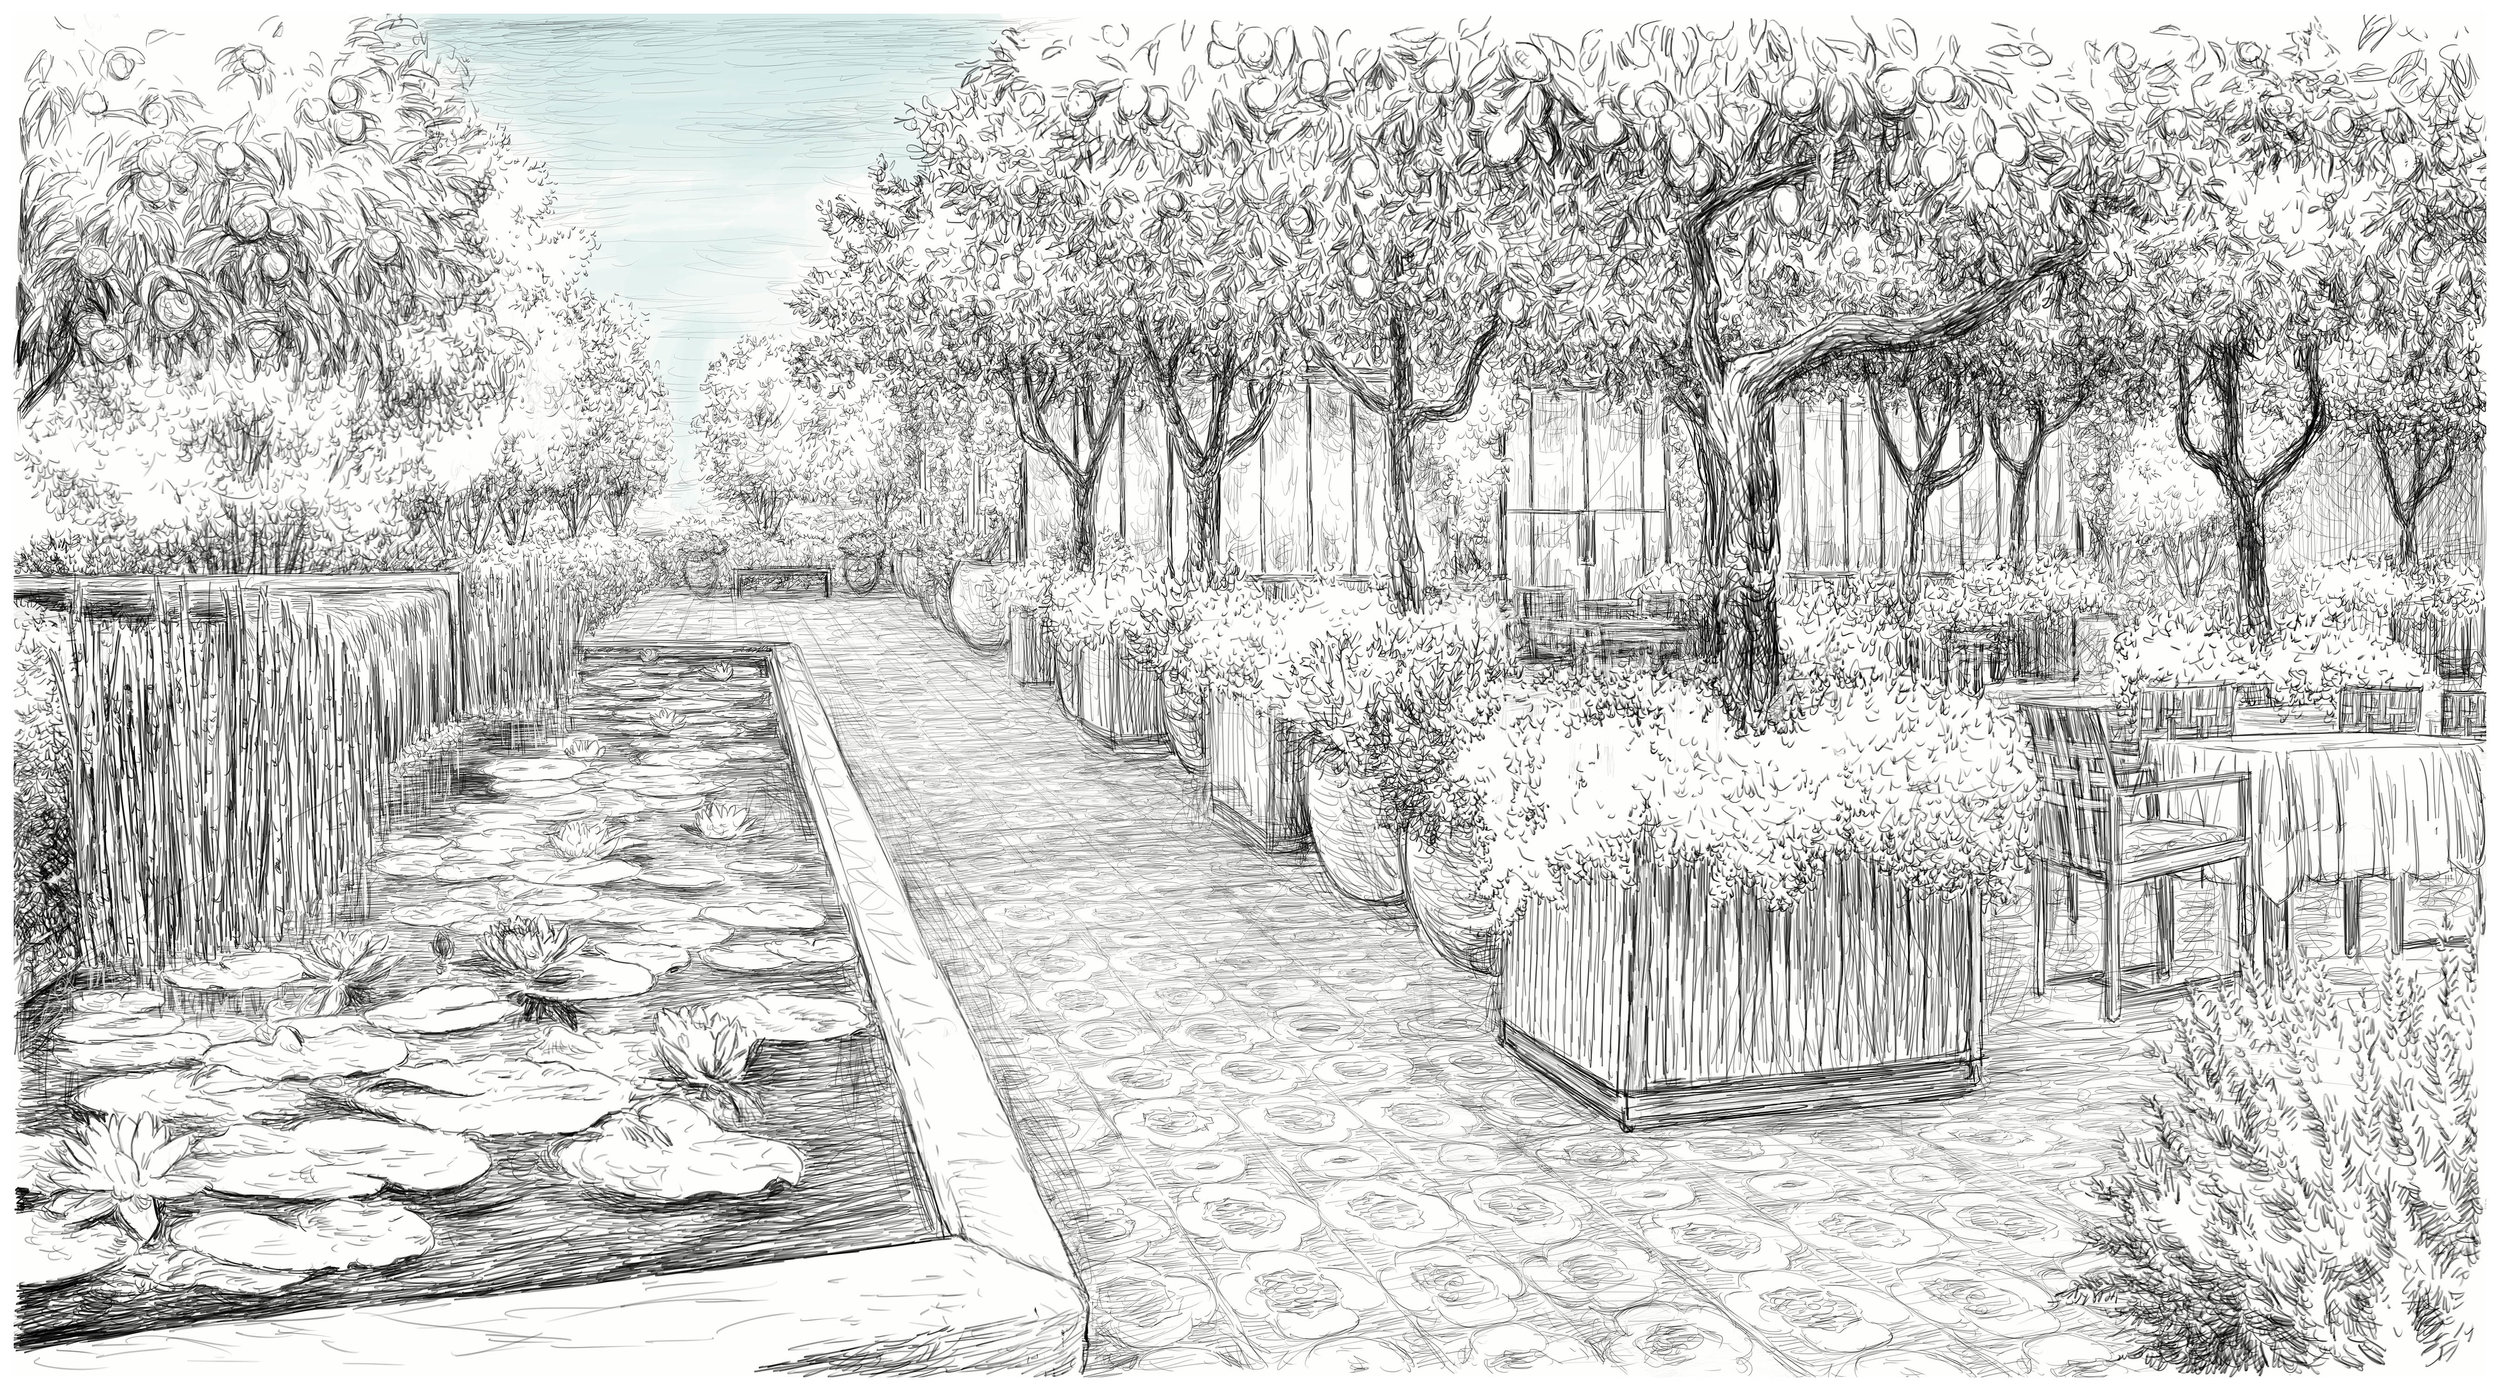 building-2 rooftop terrace (drawn by massimo milano / enea landscape architecture)